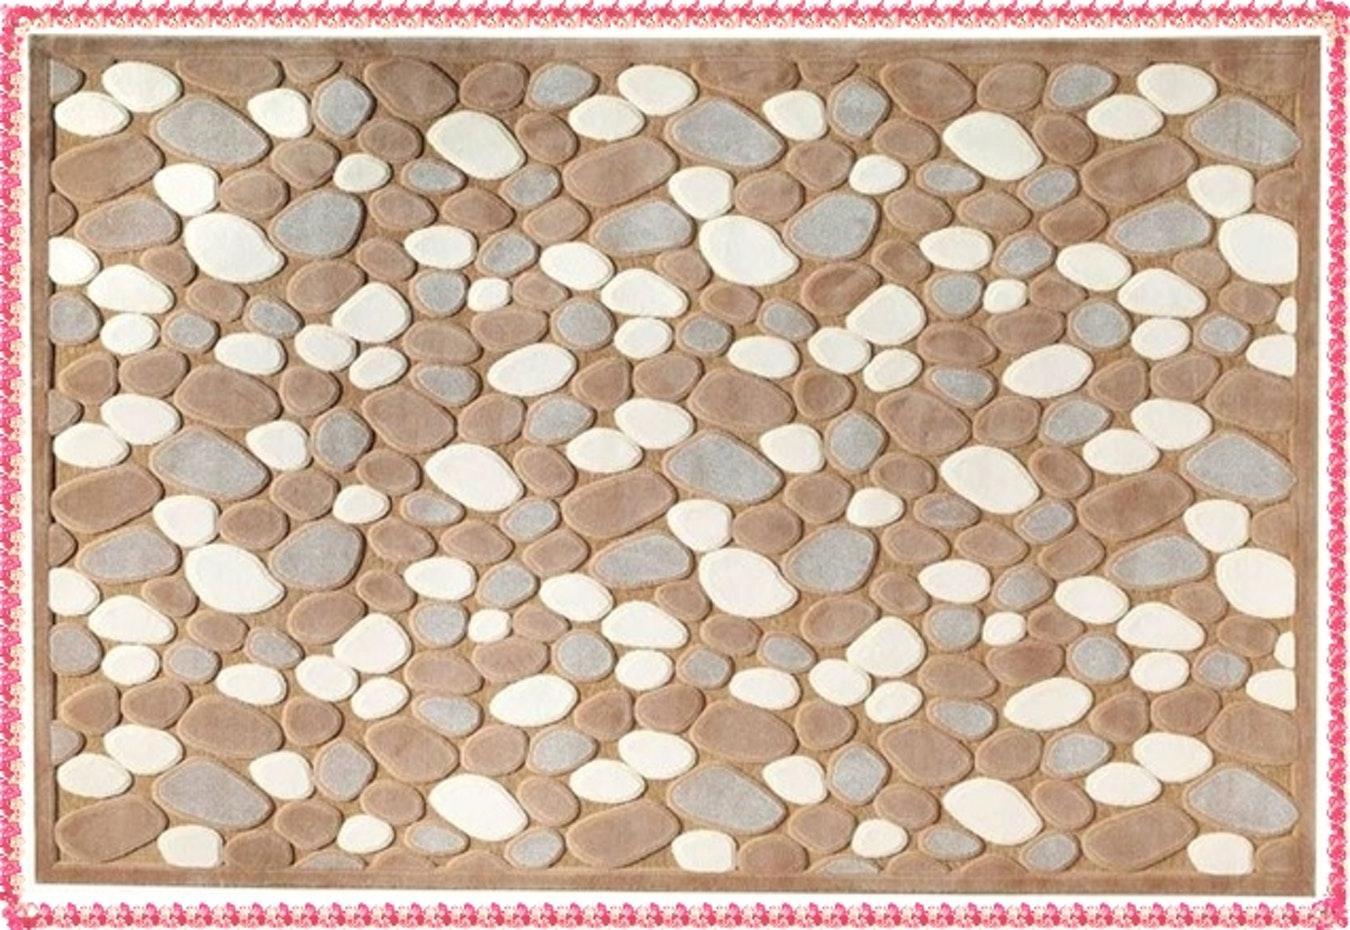 new carpet design stone patterned carpets 2016 designs unorthodox  photograph decoration 3 XGEYEUZ